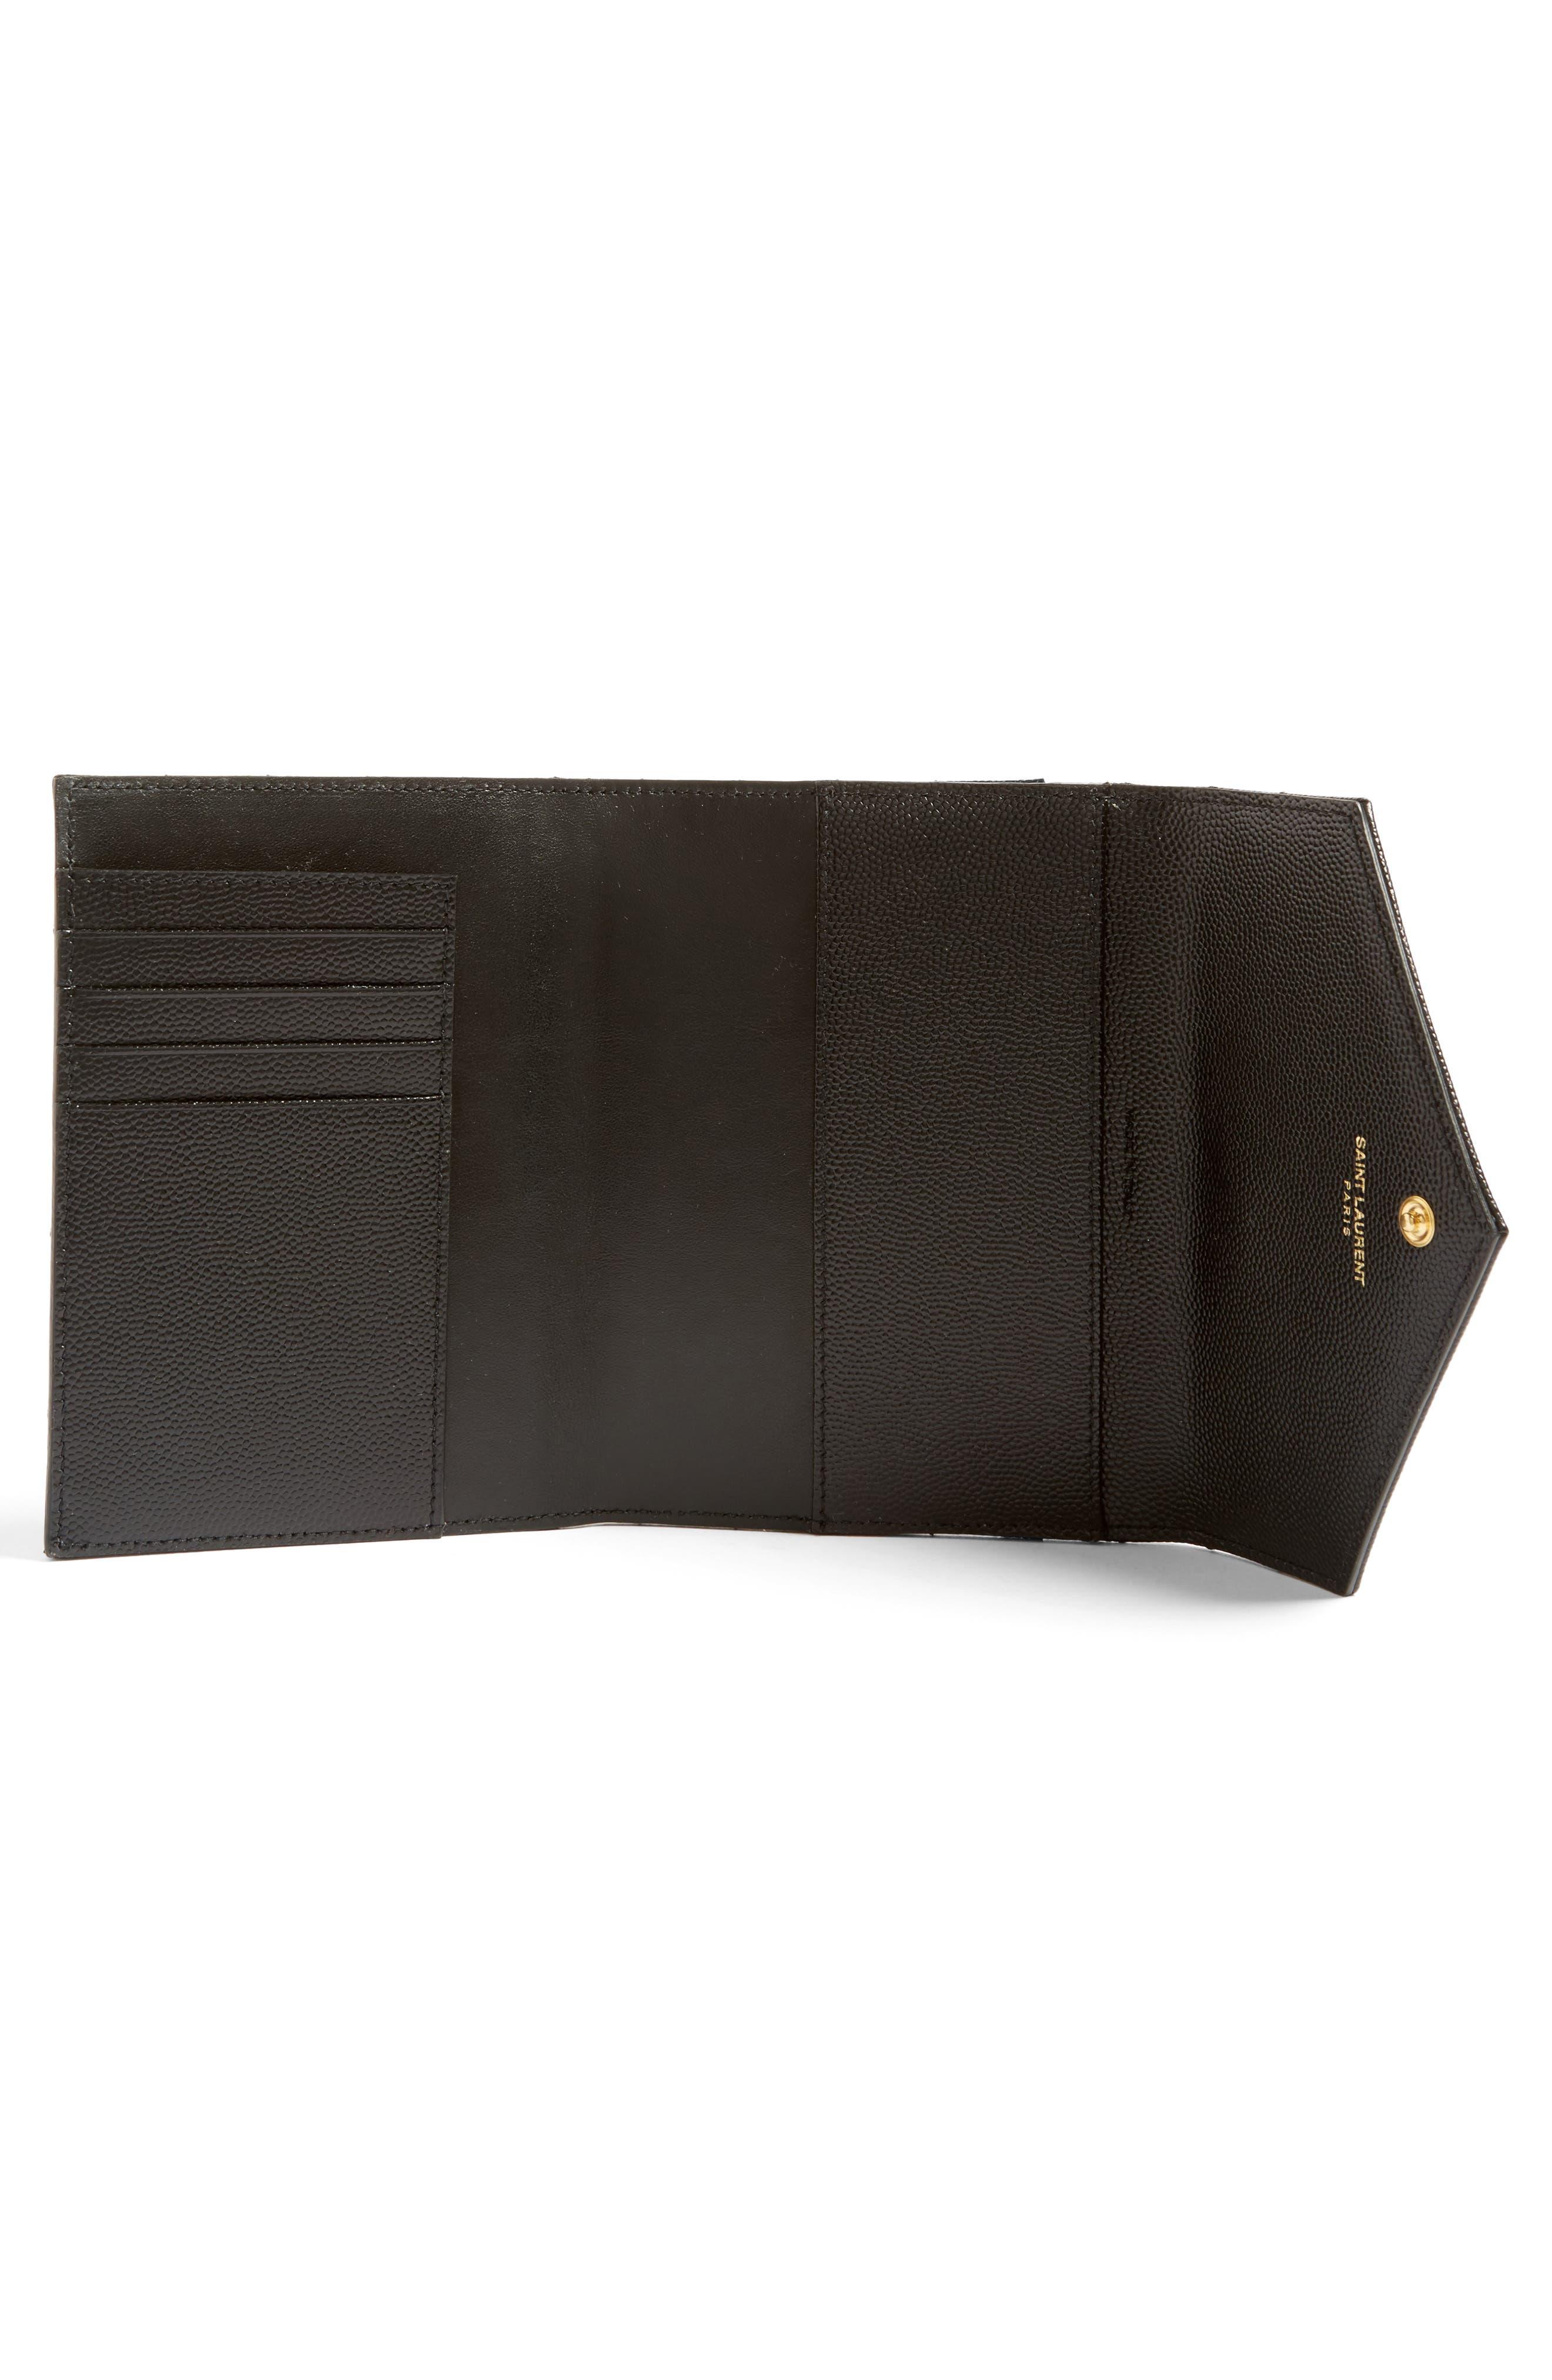 Monogram Leather Passport Case,                             Alternate thumbnail 2, color,                             001